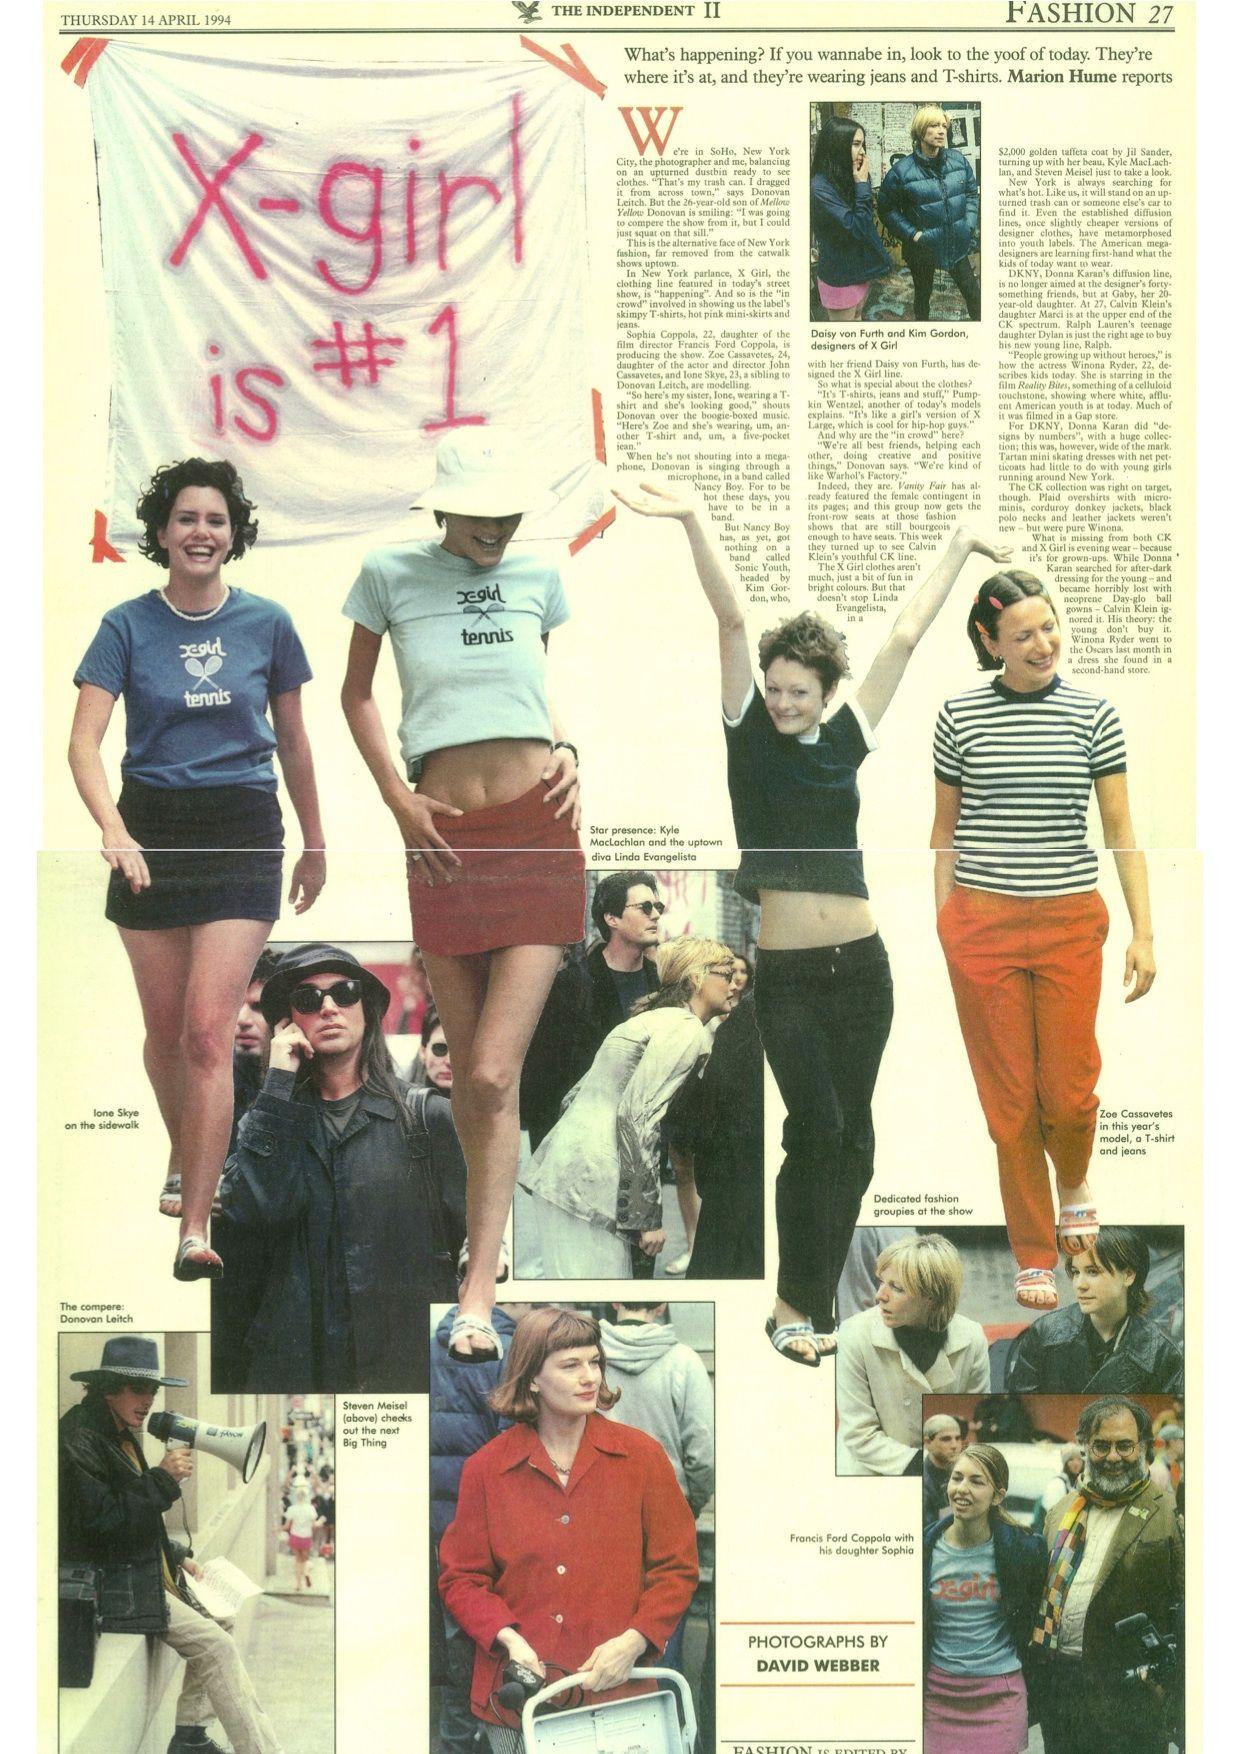 X-Girl article featuring Sofia Coppola, Kim Gordon, Zoe, Ione, Donovan  Leitch, Steven Meisel, Linda, Kyle etc | By Marion H… | Vintage fashion,  Fashion, 90s fashion